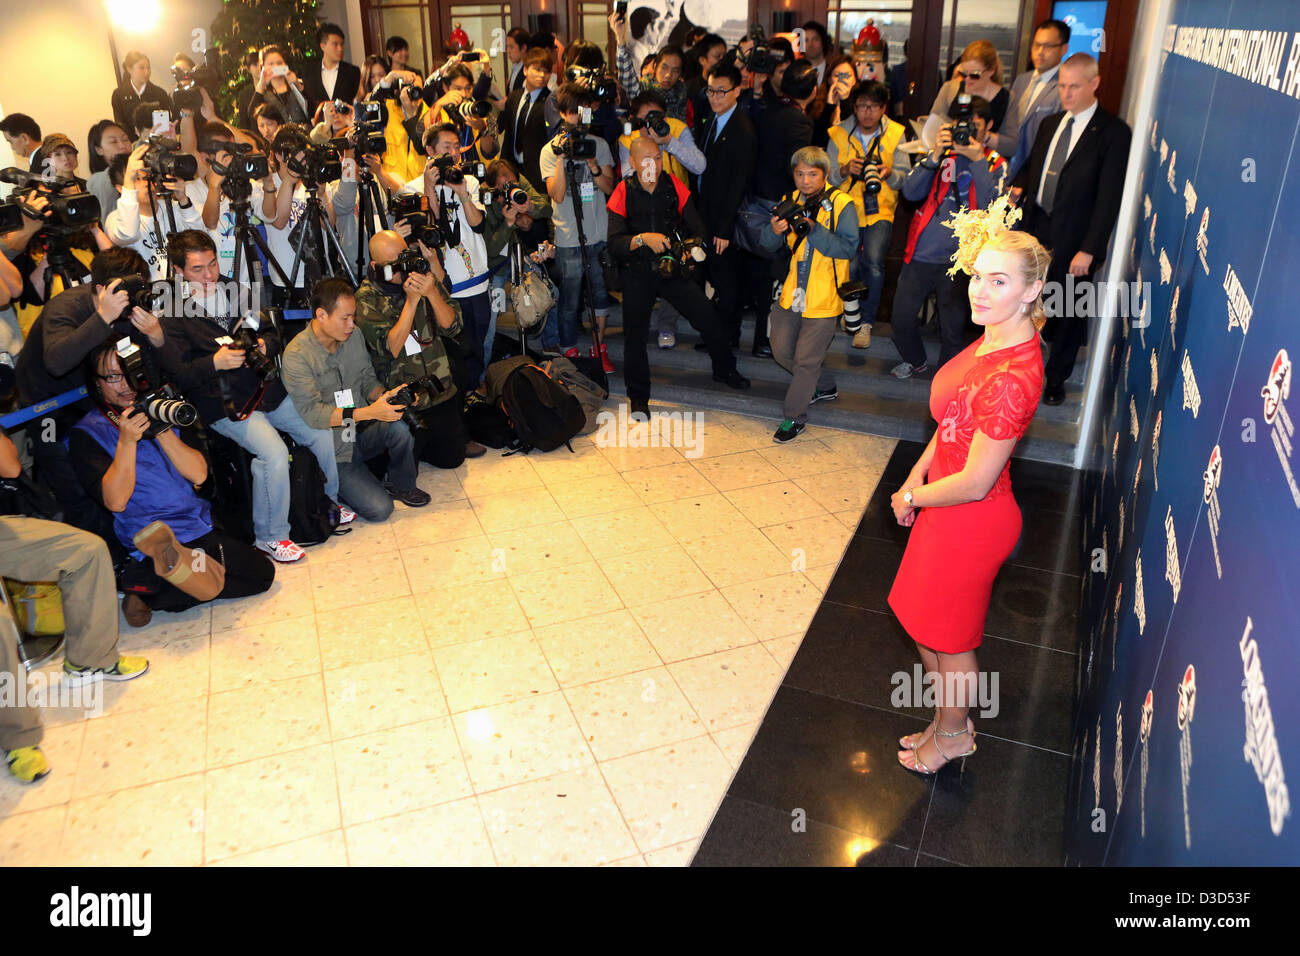 Hong Kong, China, Schauspielerin Kate Winslet vor Presse-Fotografen posiert Stockbild